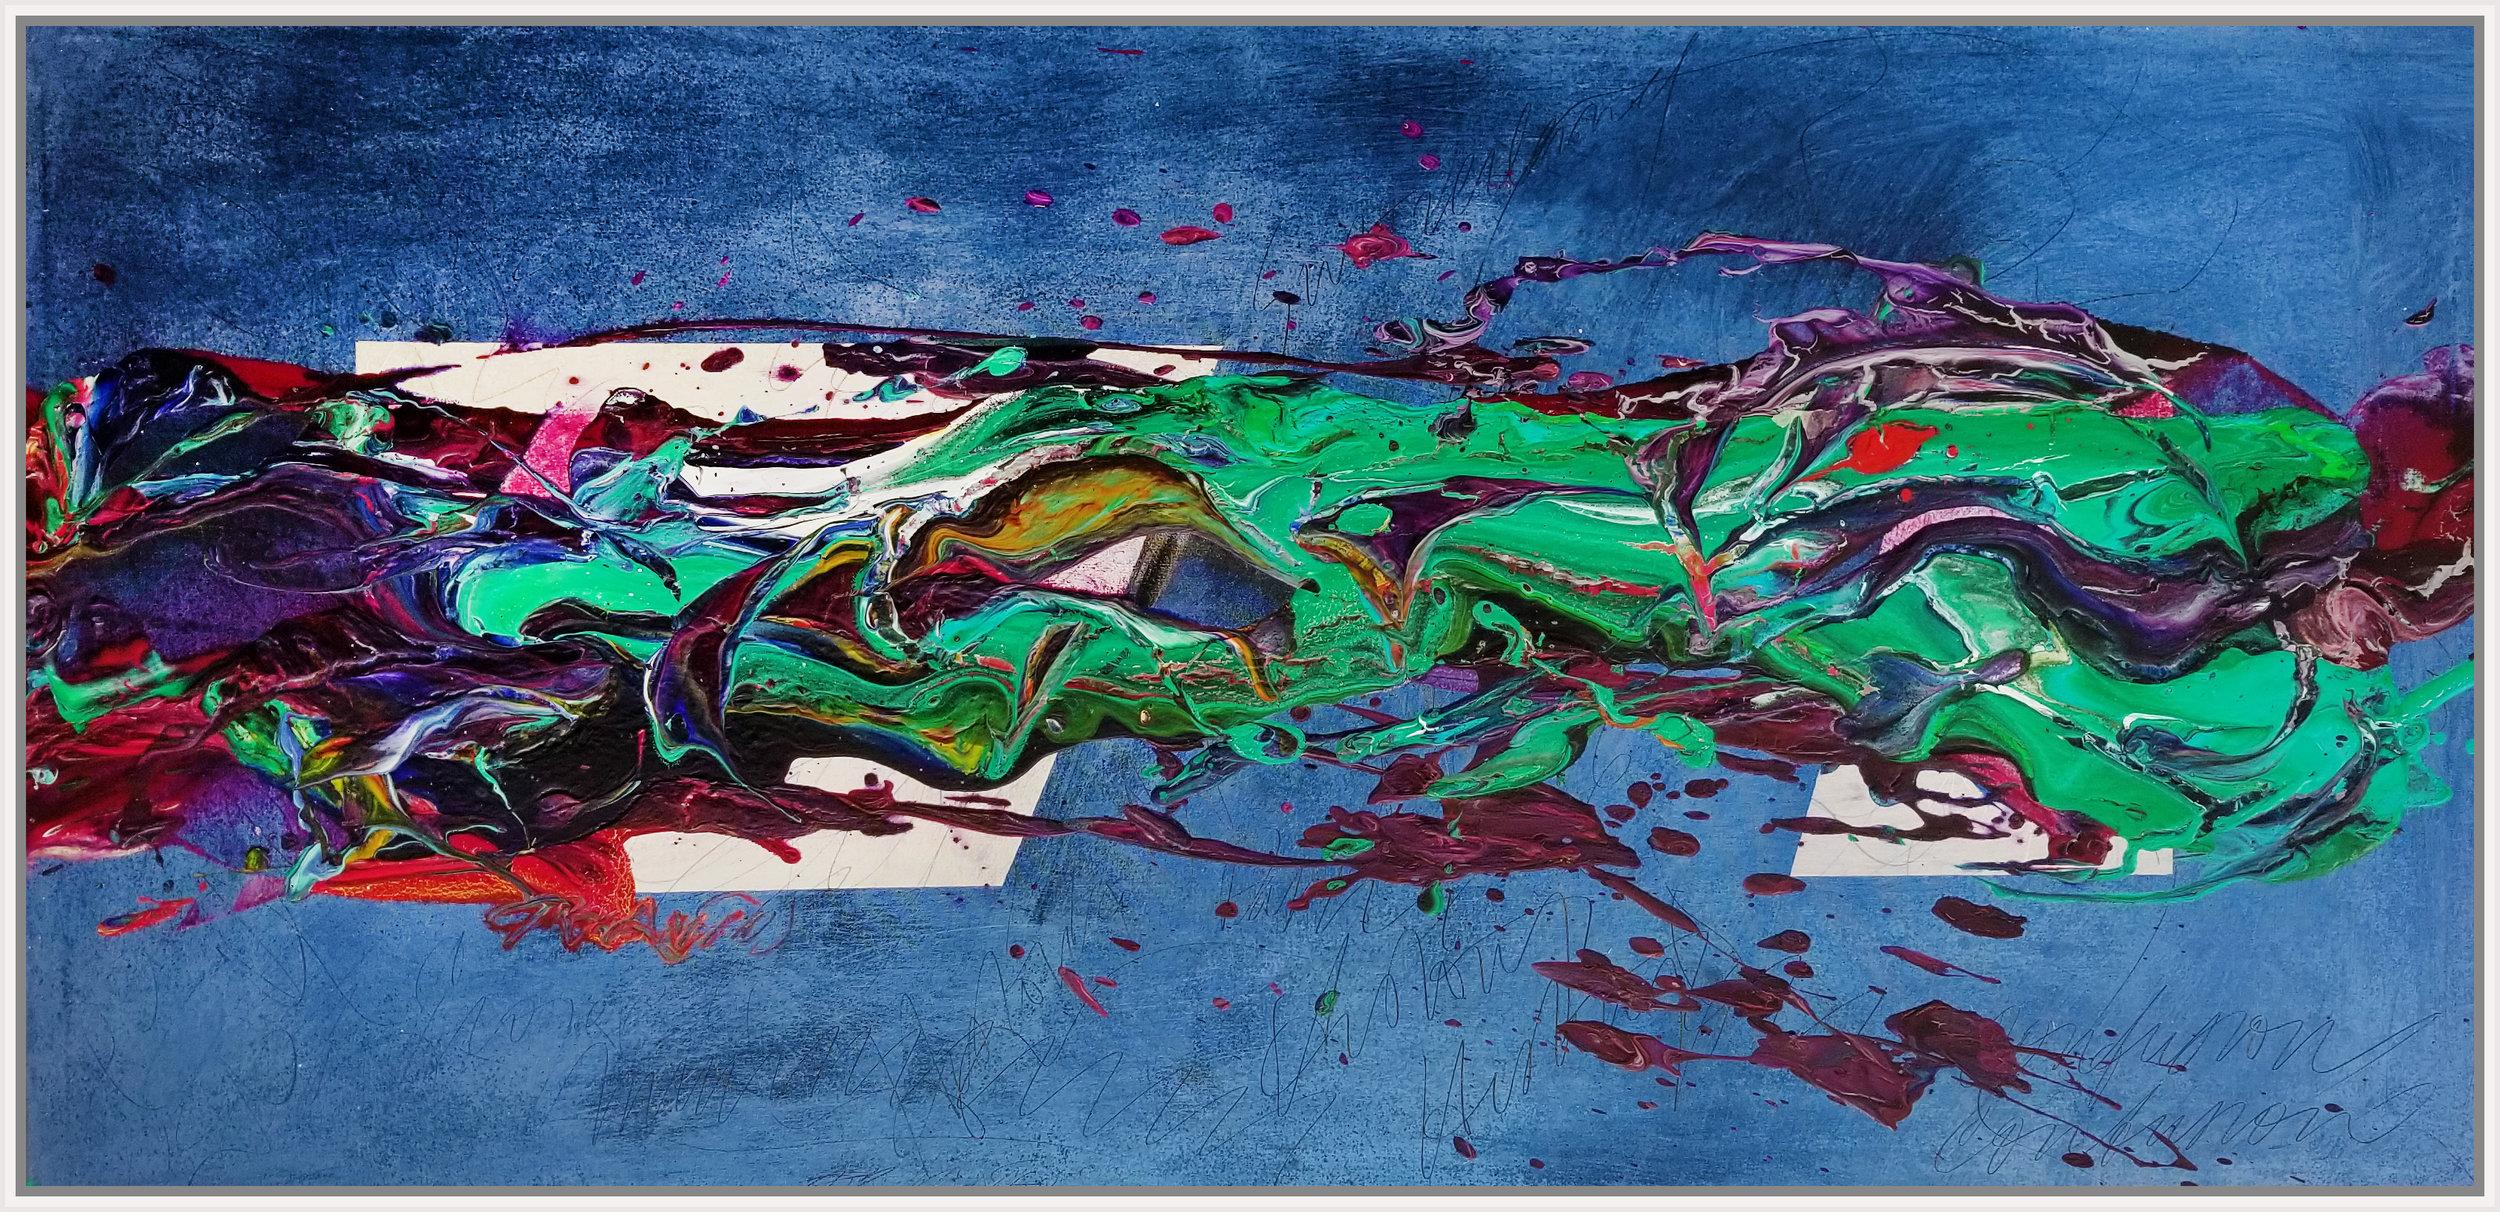 "Under the Lights #2, 2018, acrylic on canvas, 29"" x 59"" (73.7 x 150 cm)"